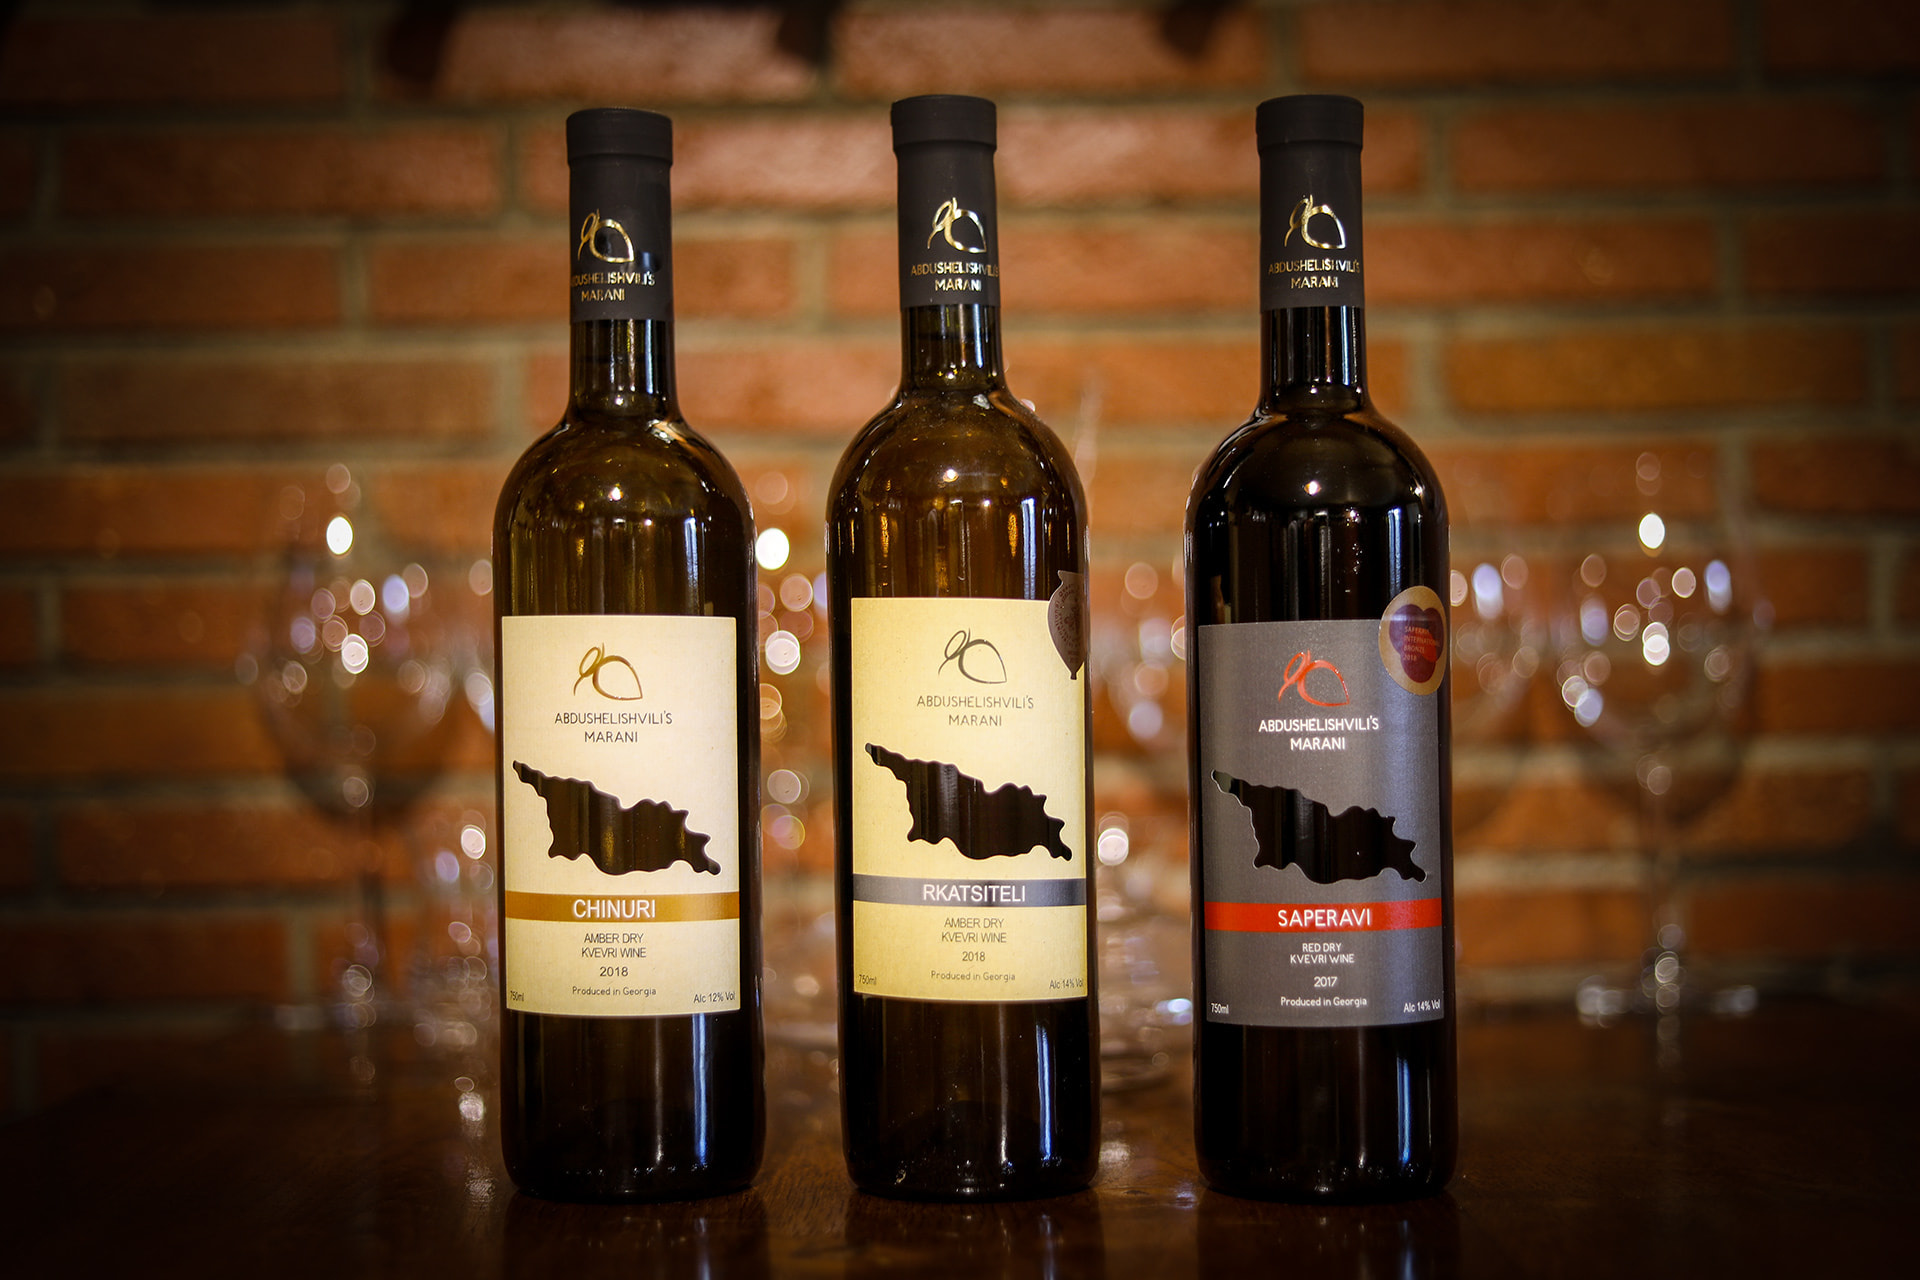 Abdushelishvili Winery Amber and Red wine tasting package